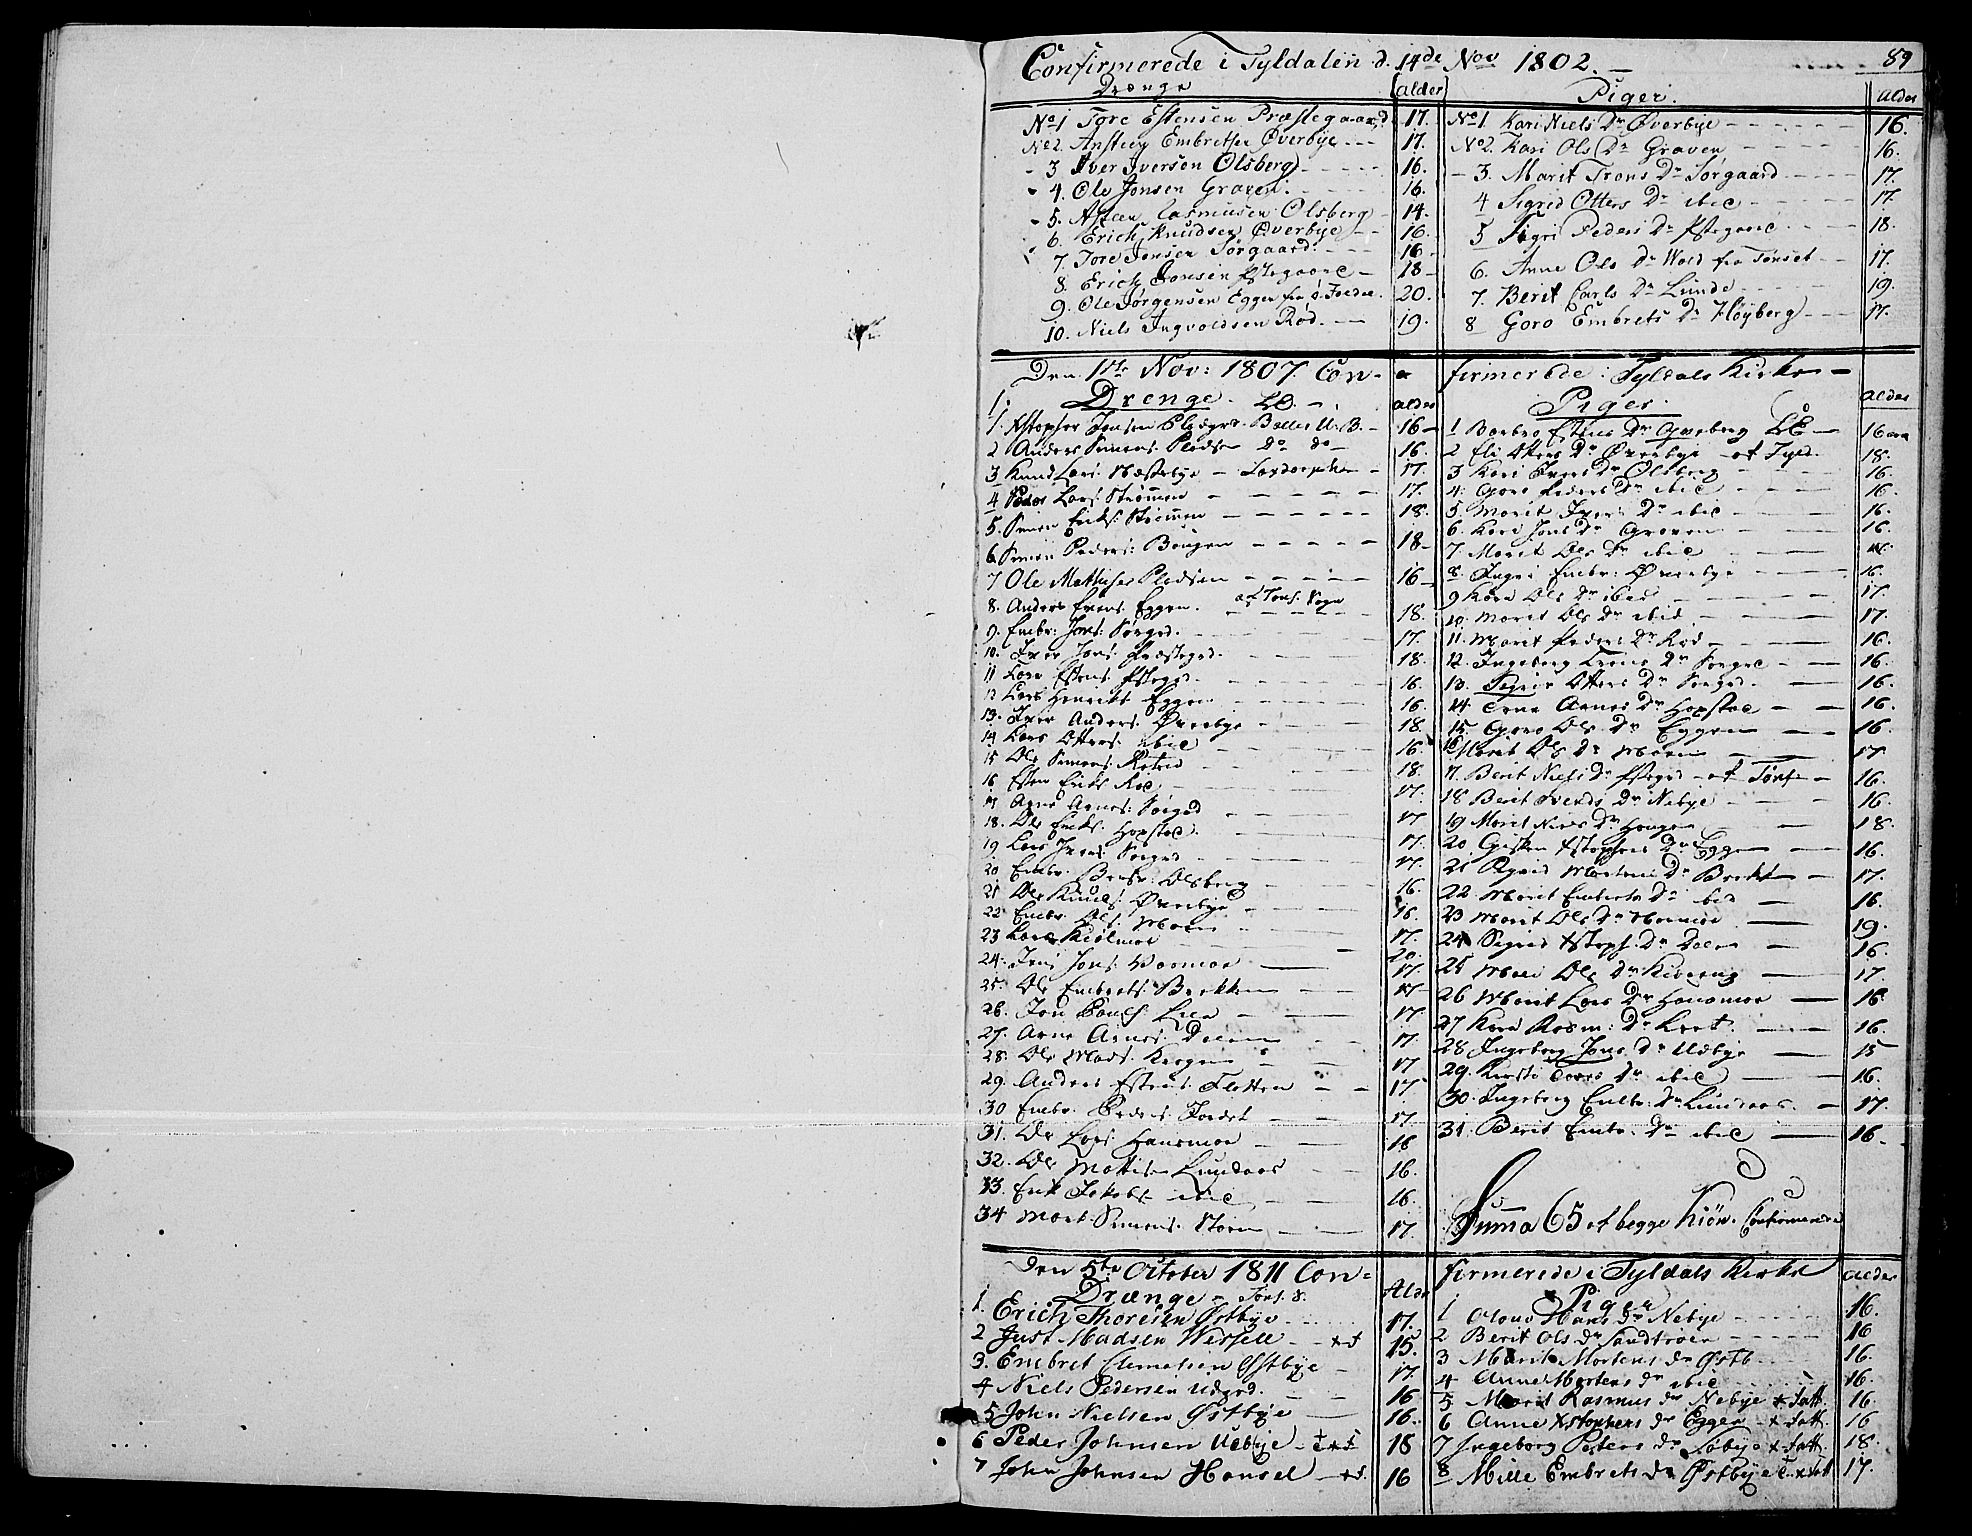 SAH, Tynset prestekontor, Ministerialbok nr. 17, 1801-1814, s. 89